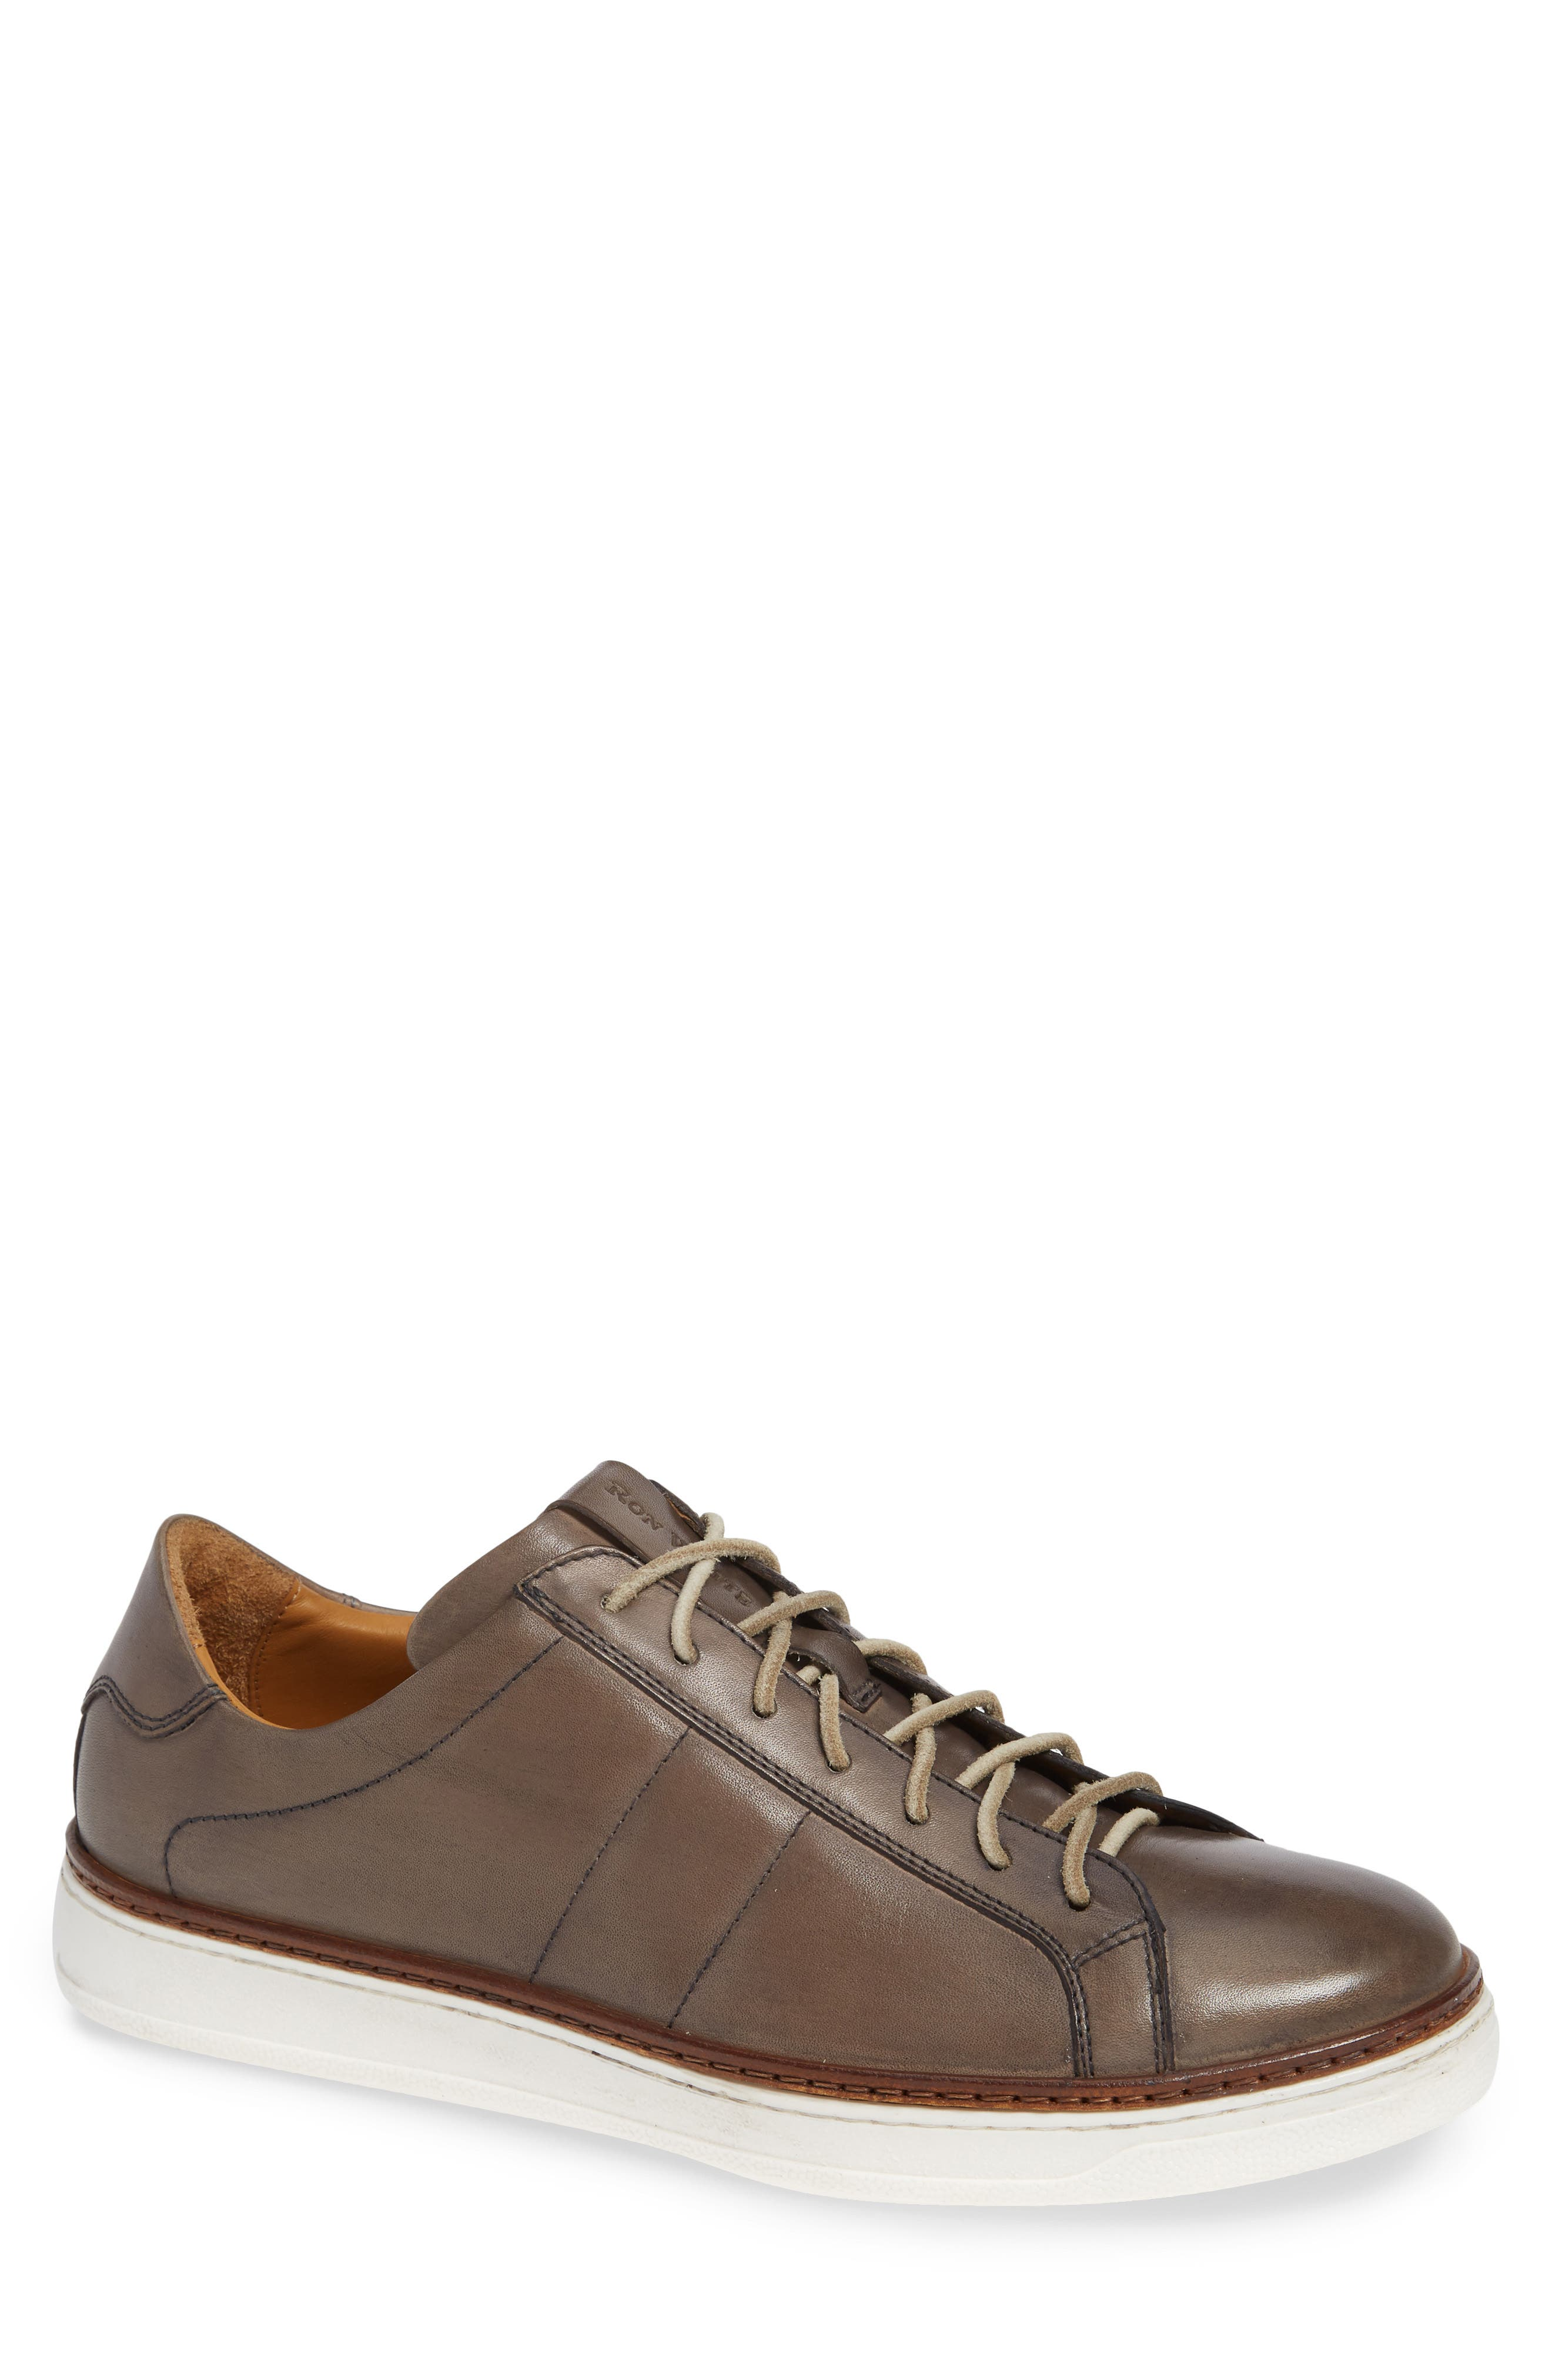 RON WHITE Dolan Sneaker, Main, color, 200